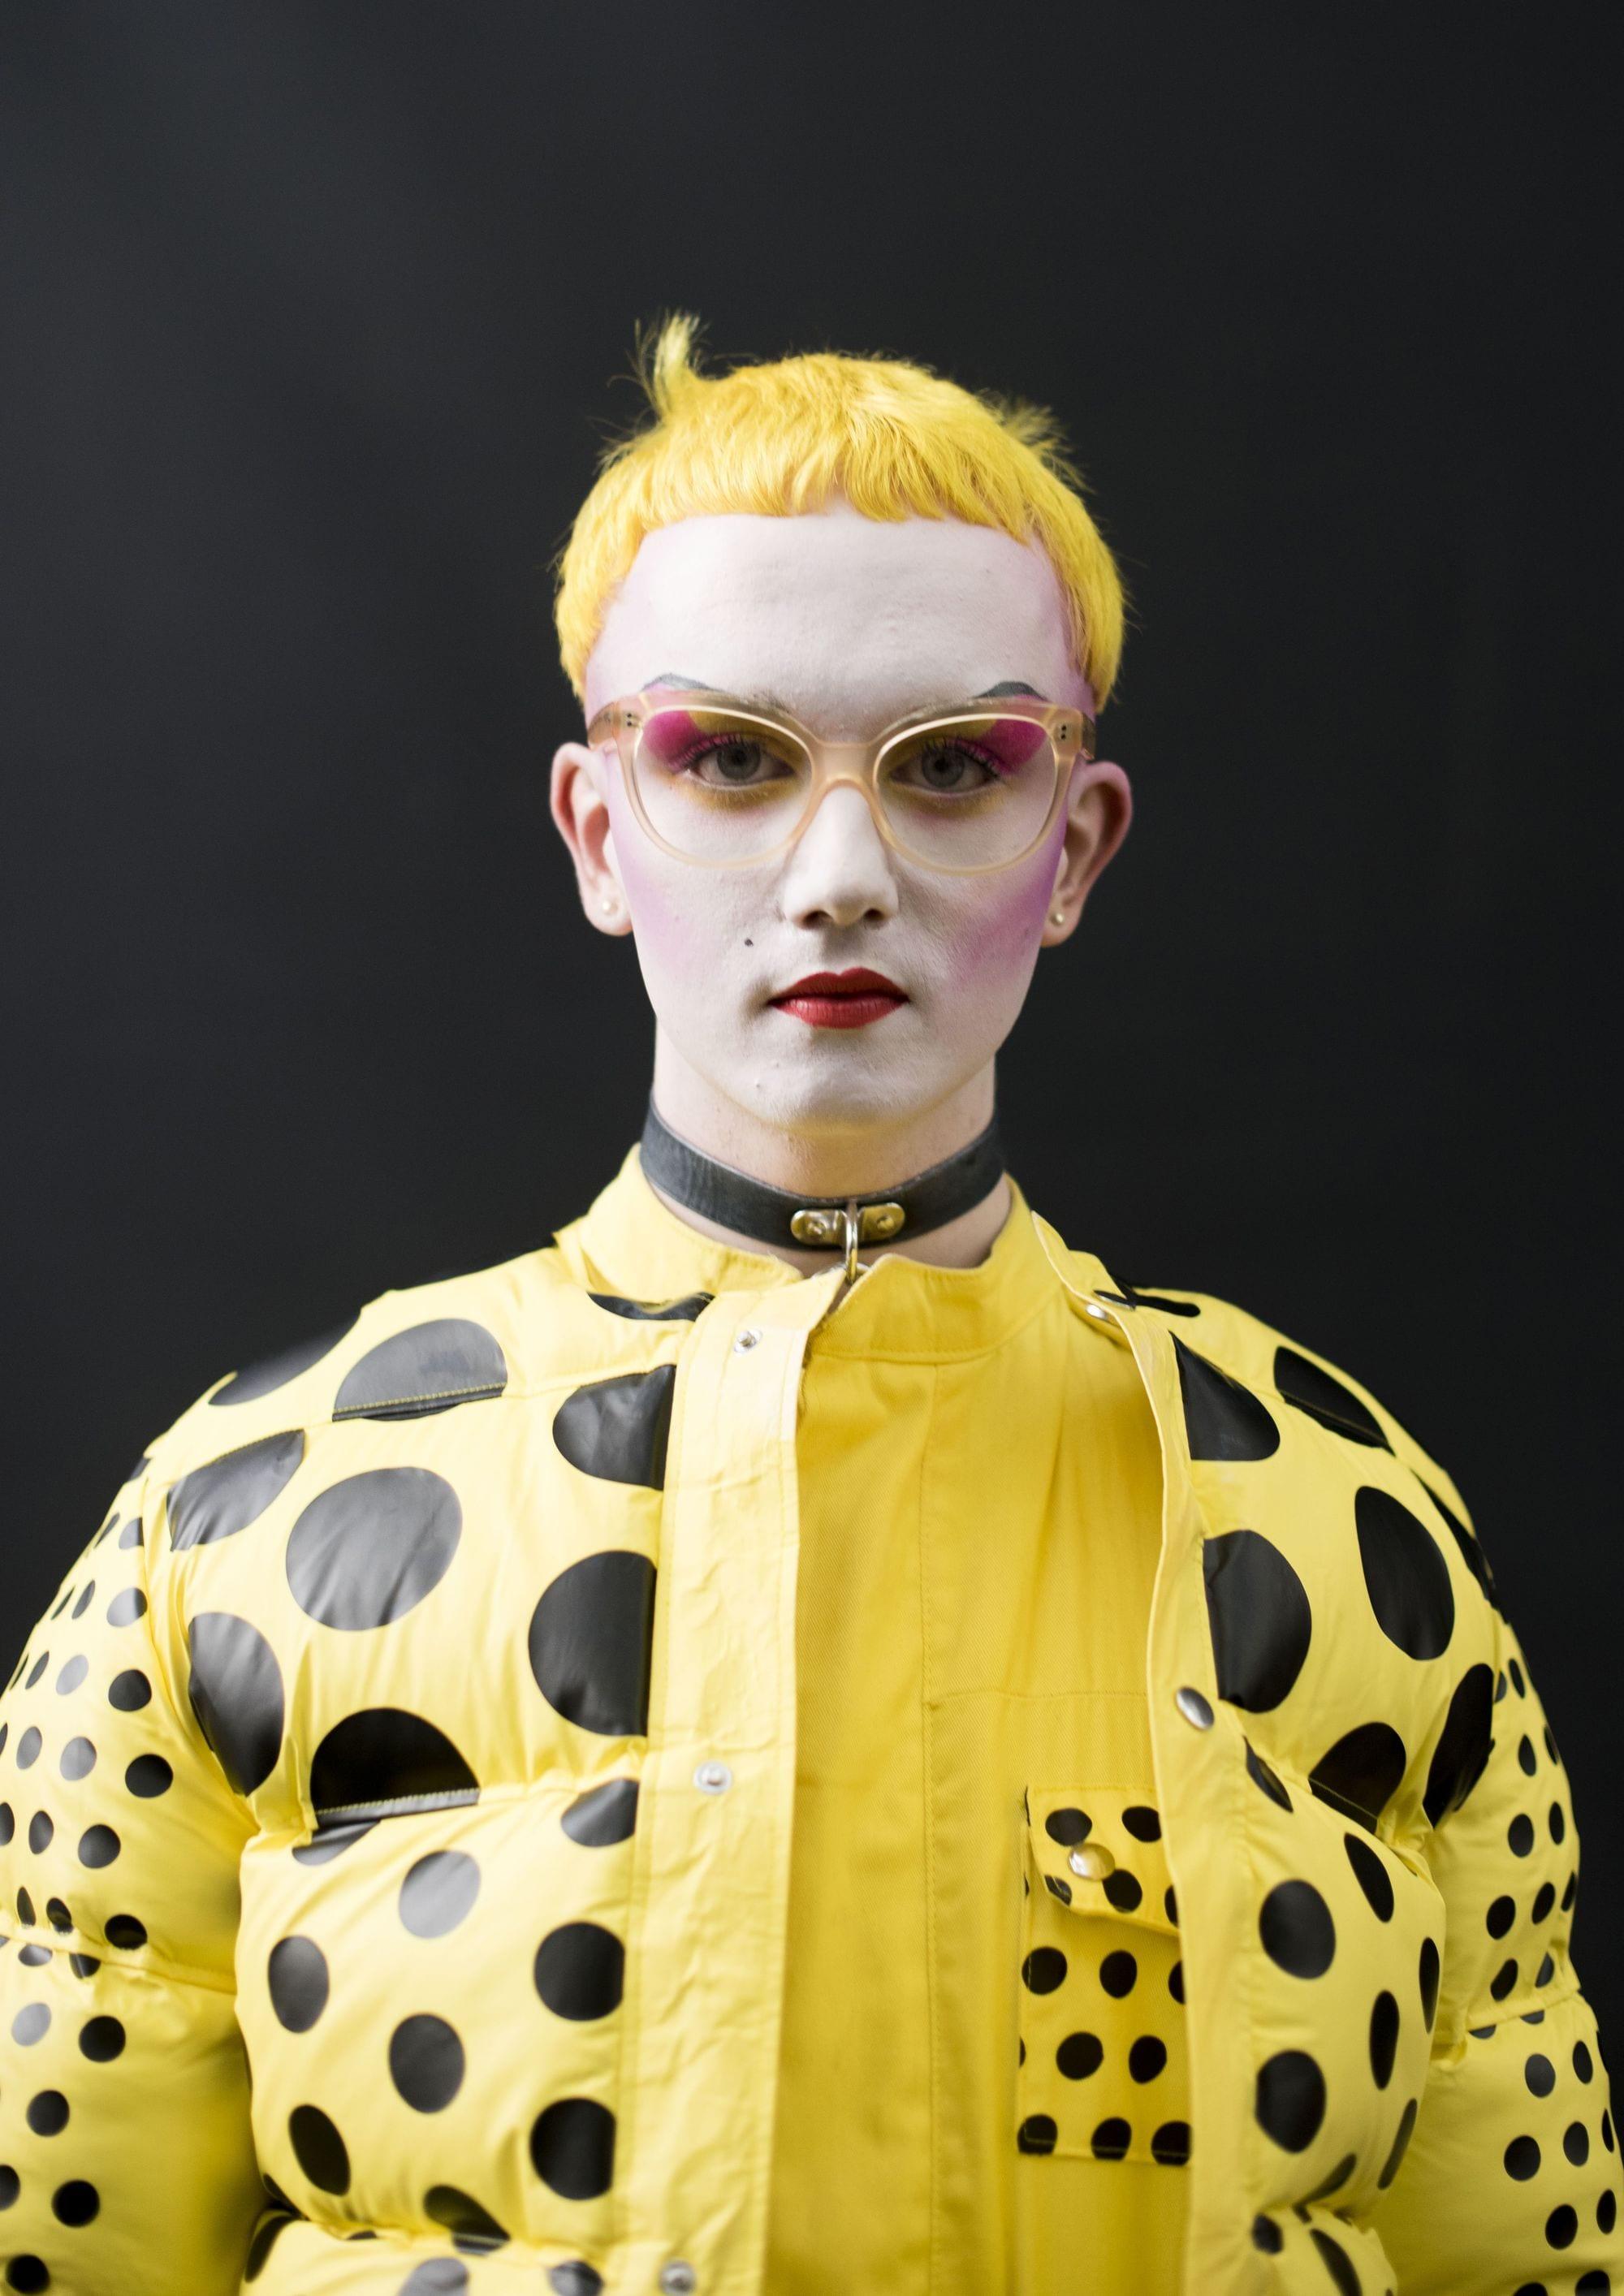 pixie en Pelo Amarillo